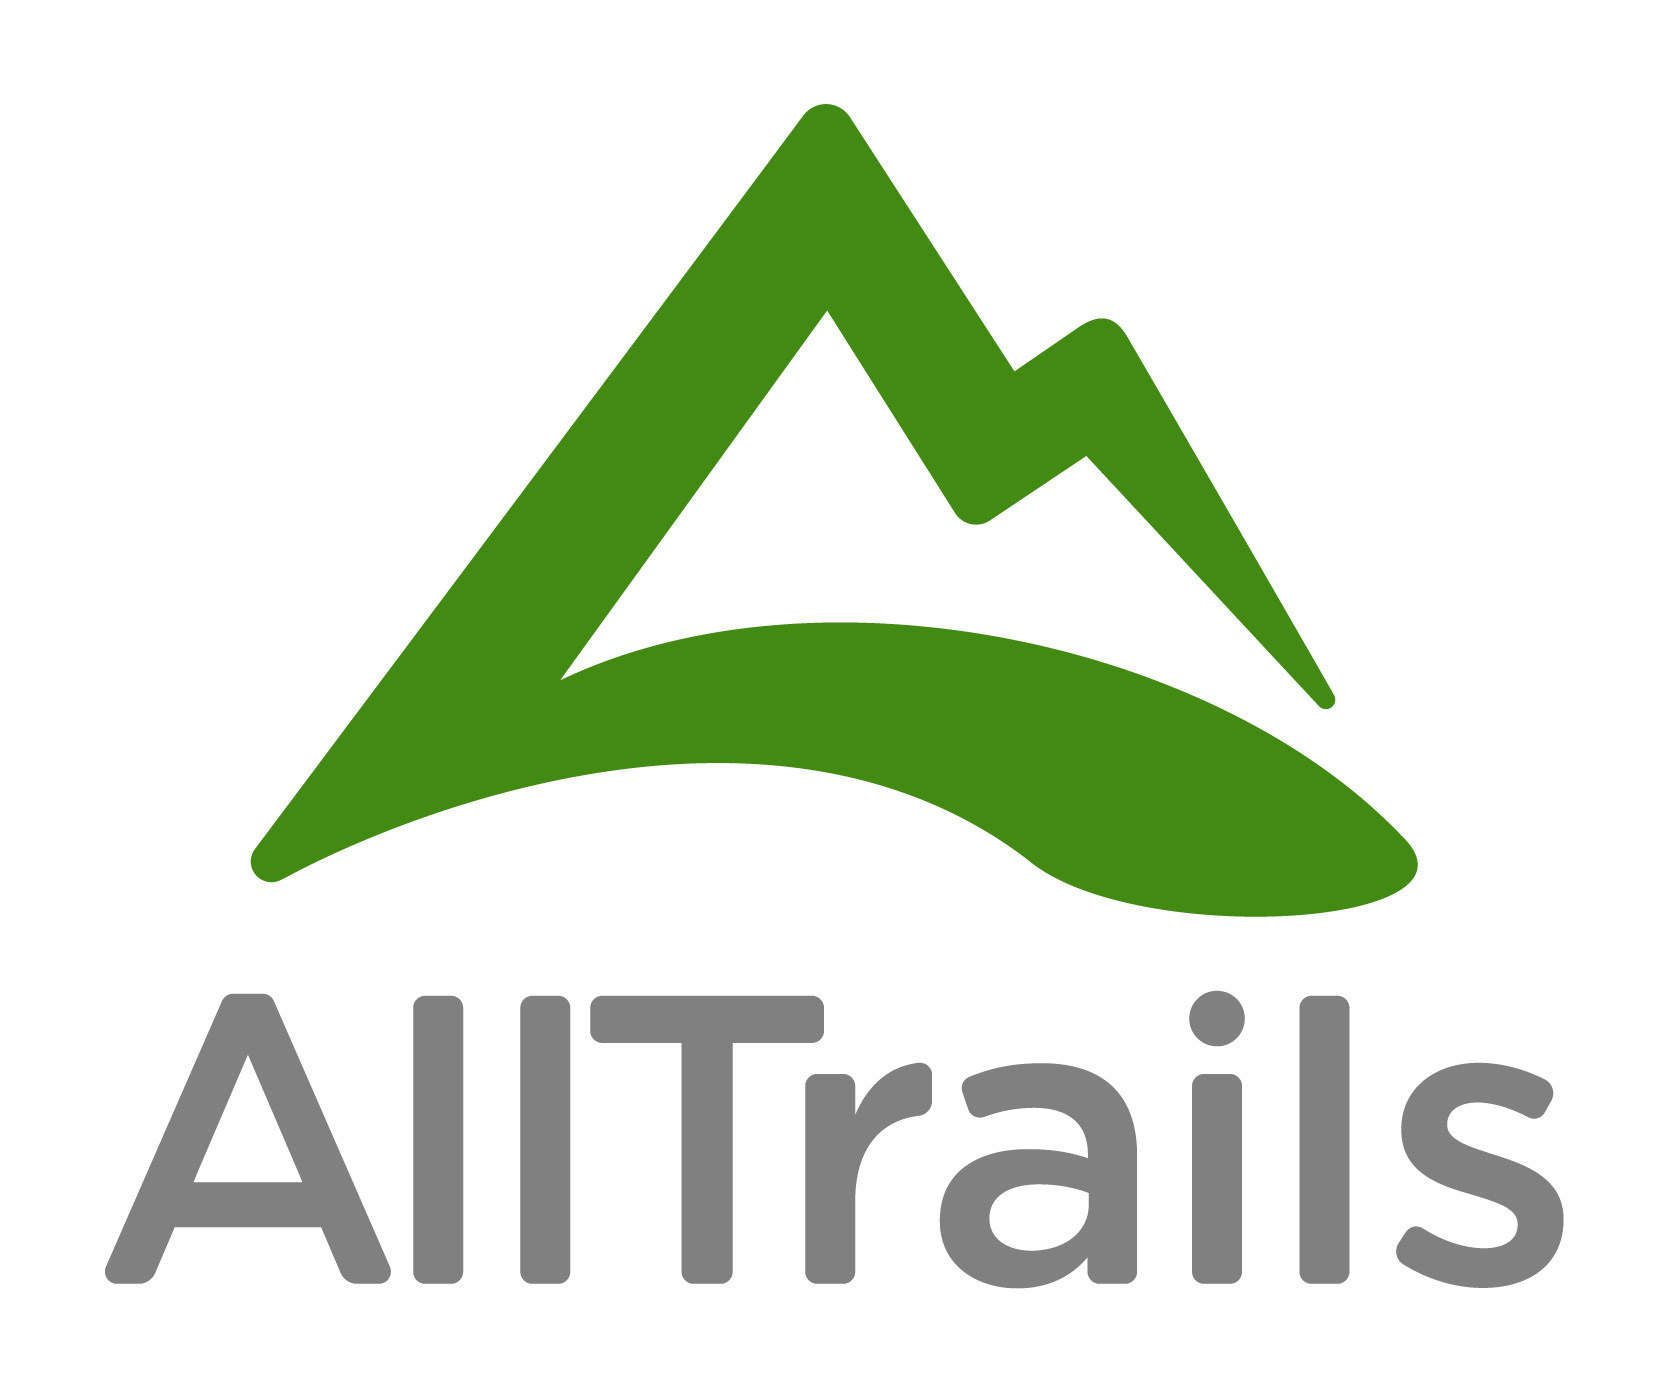 AllTrails® Acquires Trails.com